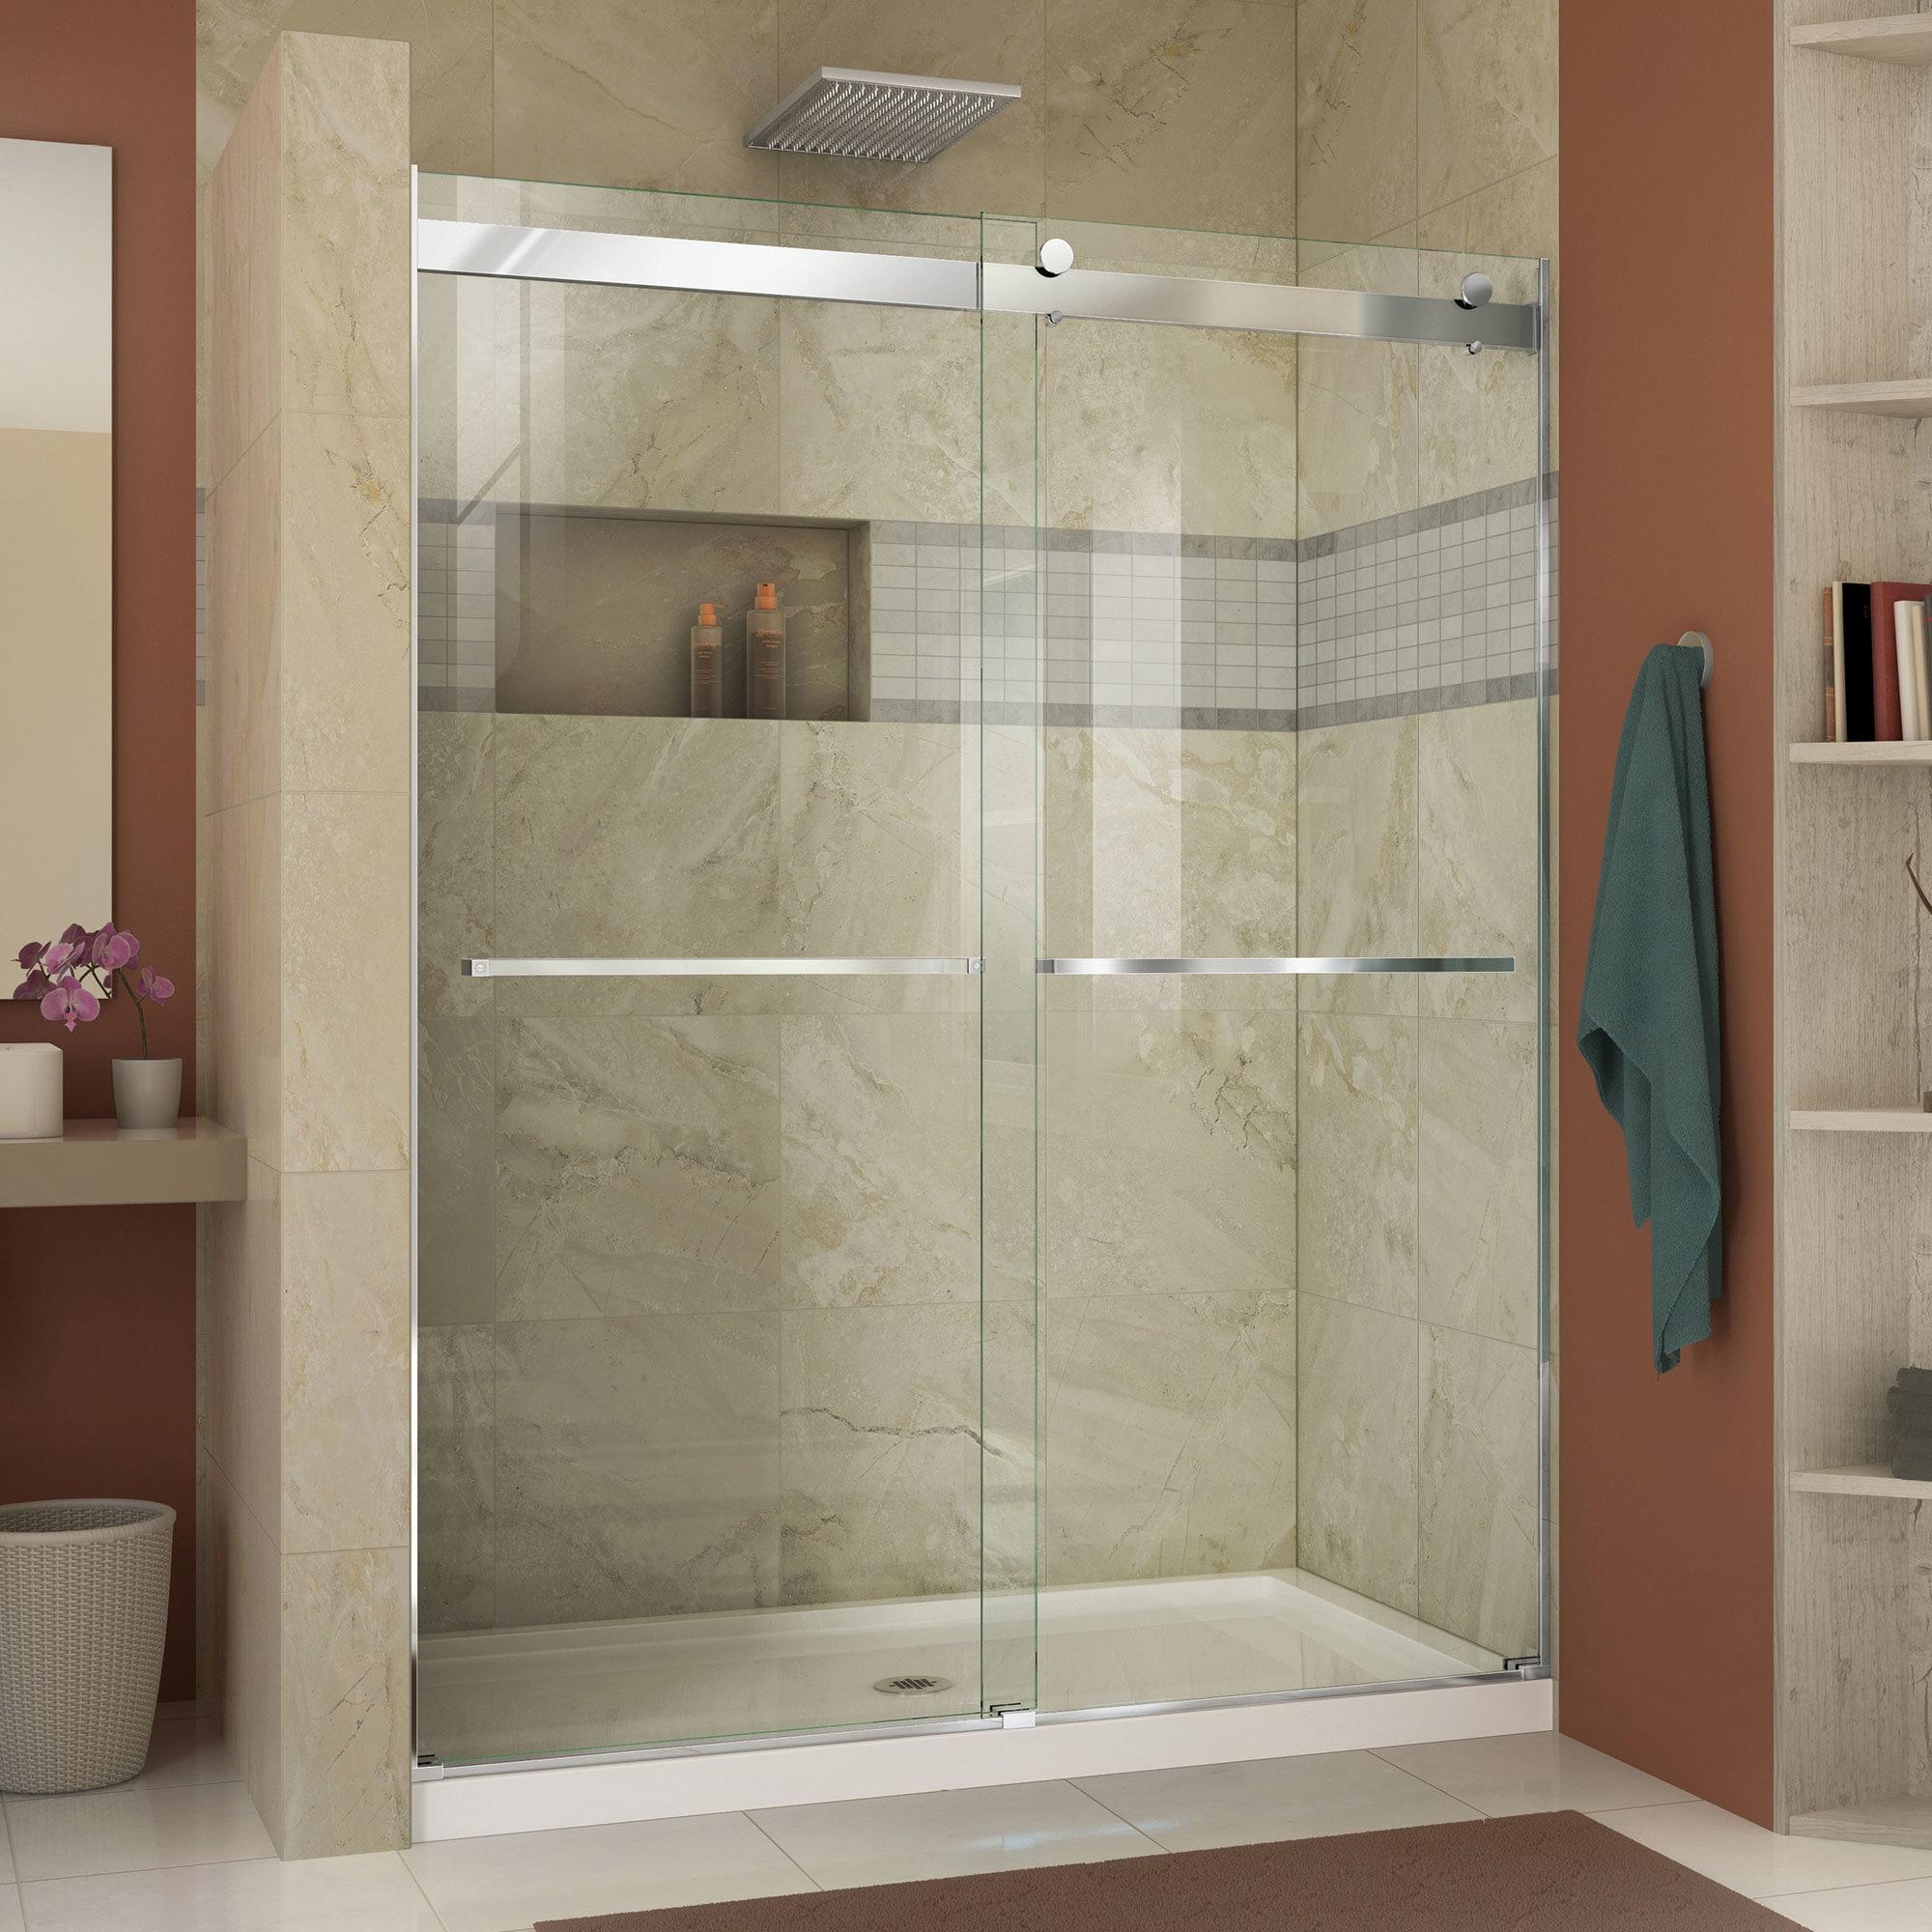 Frameless Bypass Shower Door - Free Shipping Today - Overstock.com -  19747226